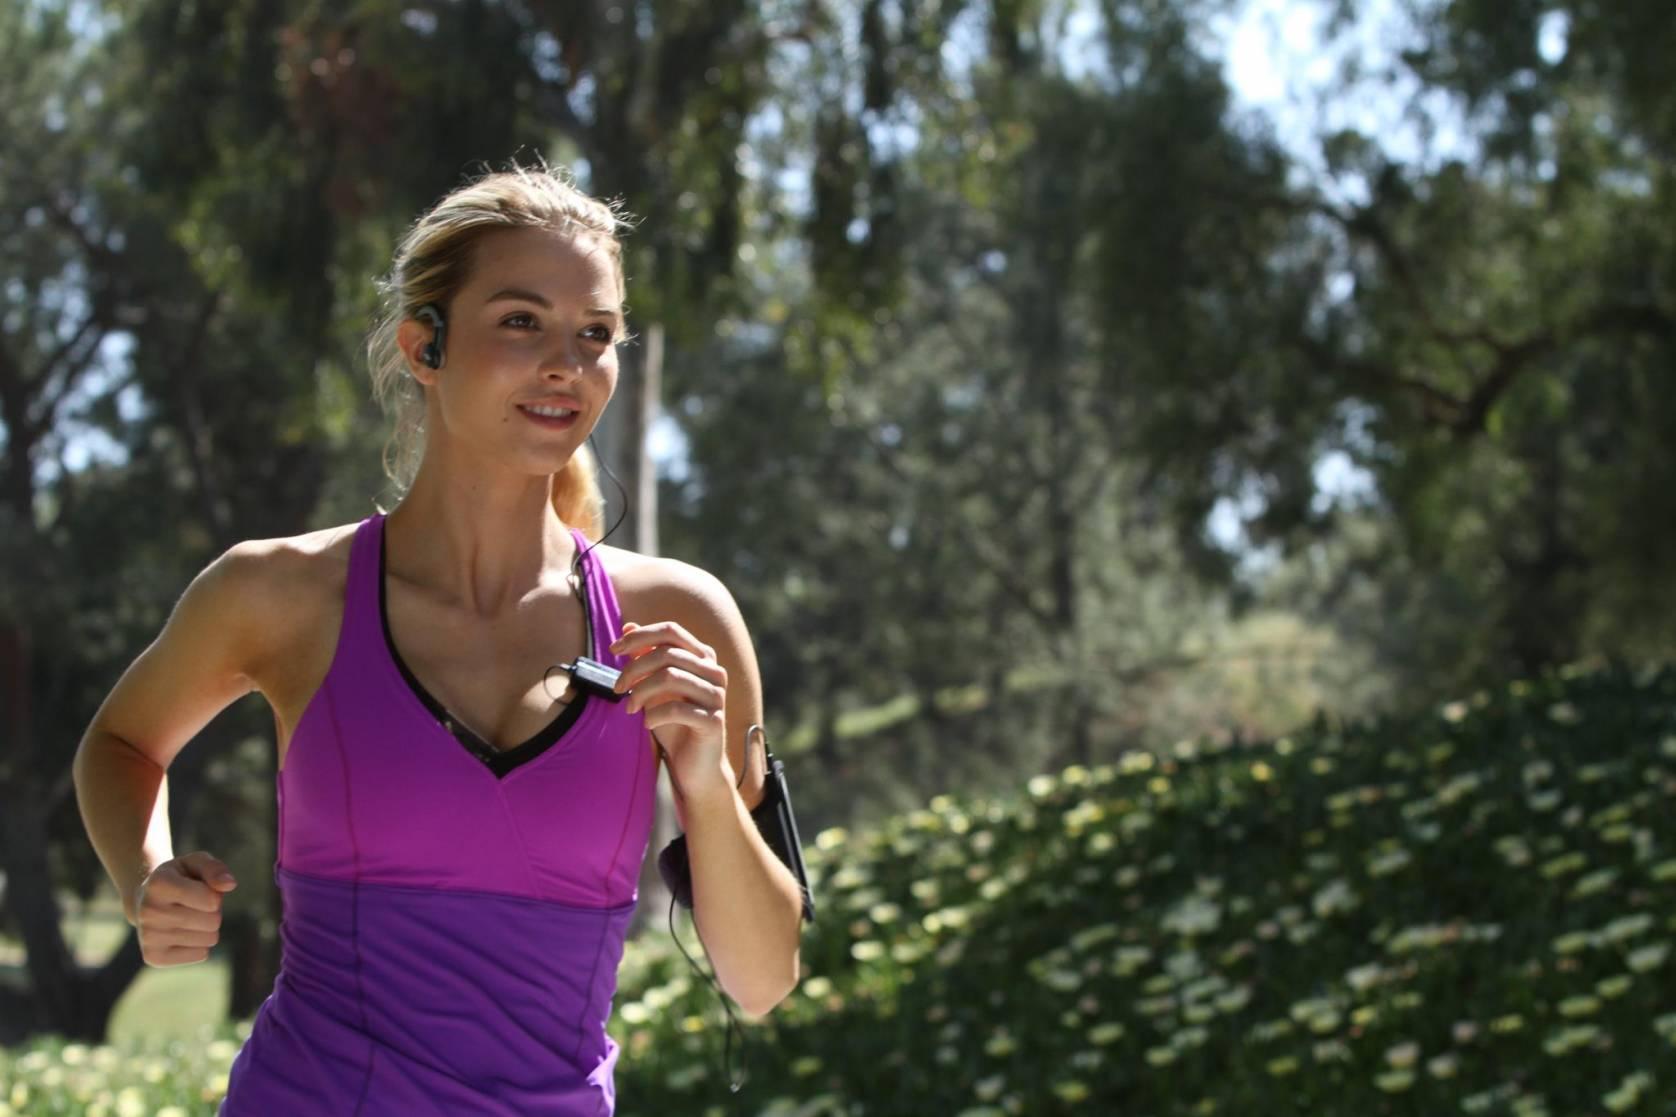 woman in magenta tank top running with AfterShokz Bone Conduction Headphones